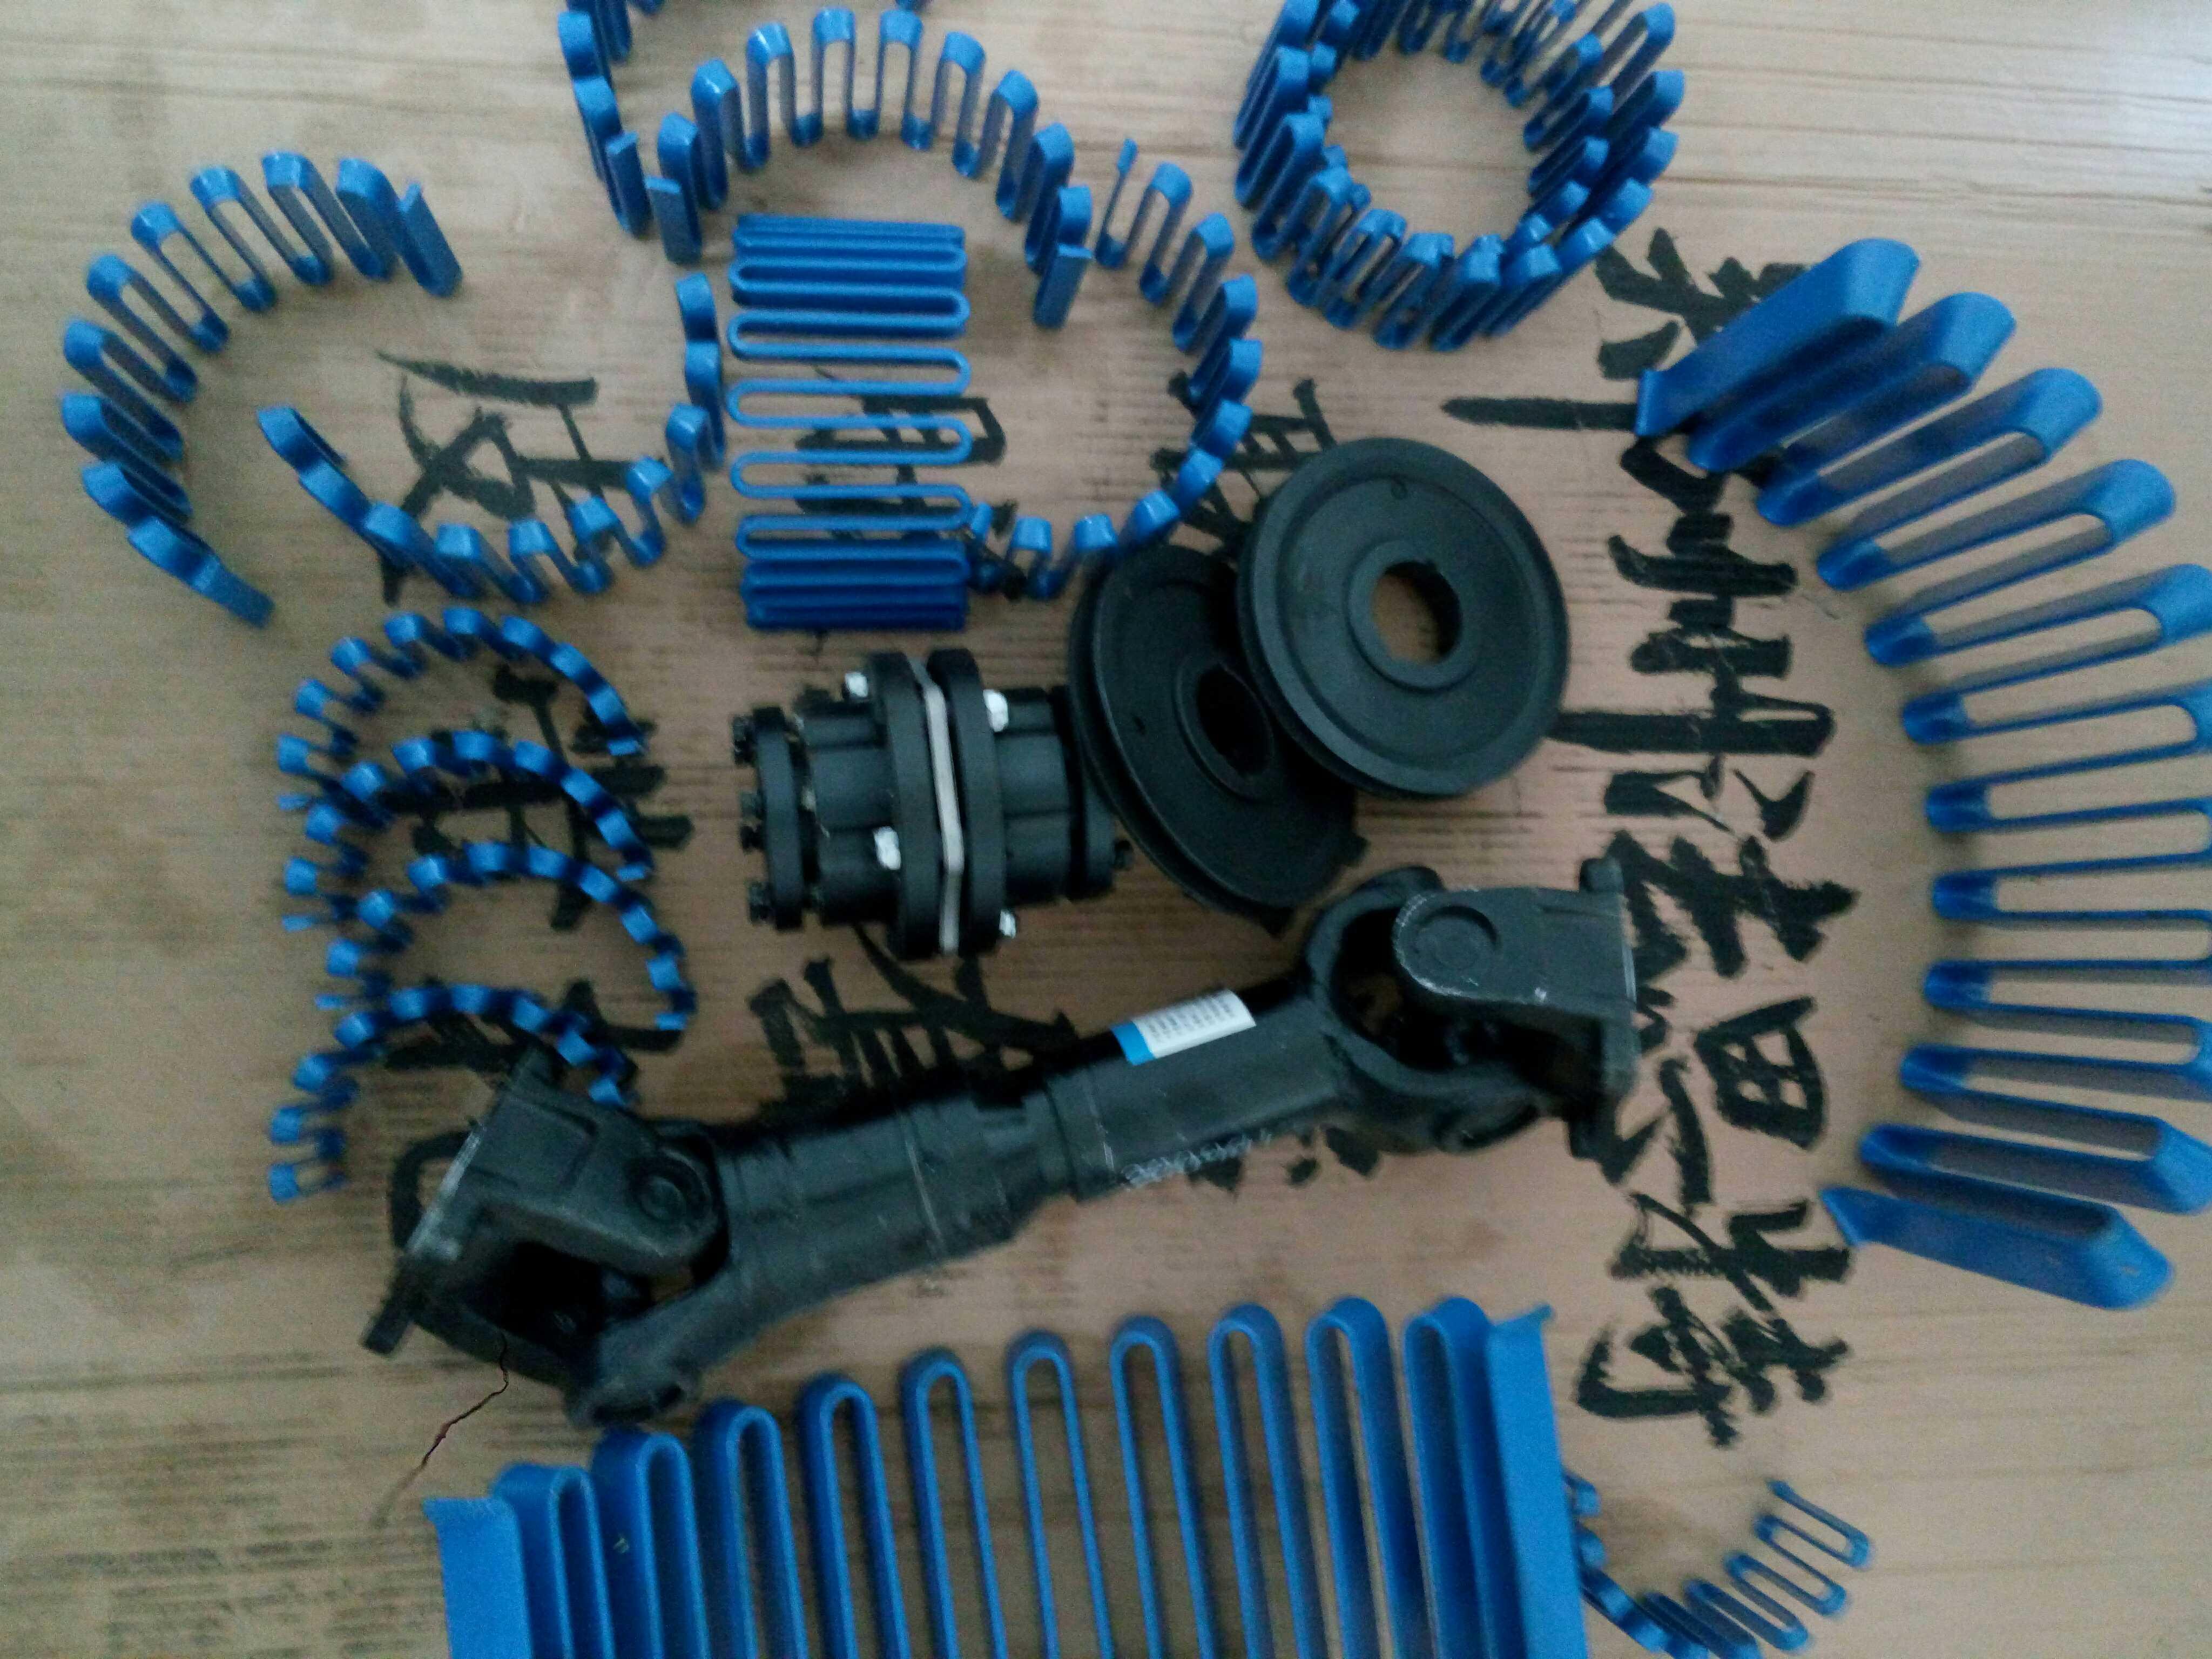 JS蛇形弹簧联轴器 河南JS蛇形弹簧联轴器厂家直销